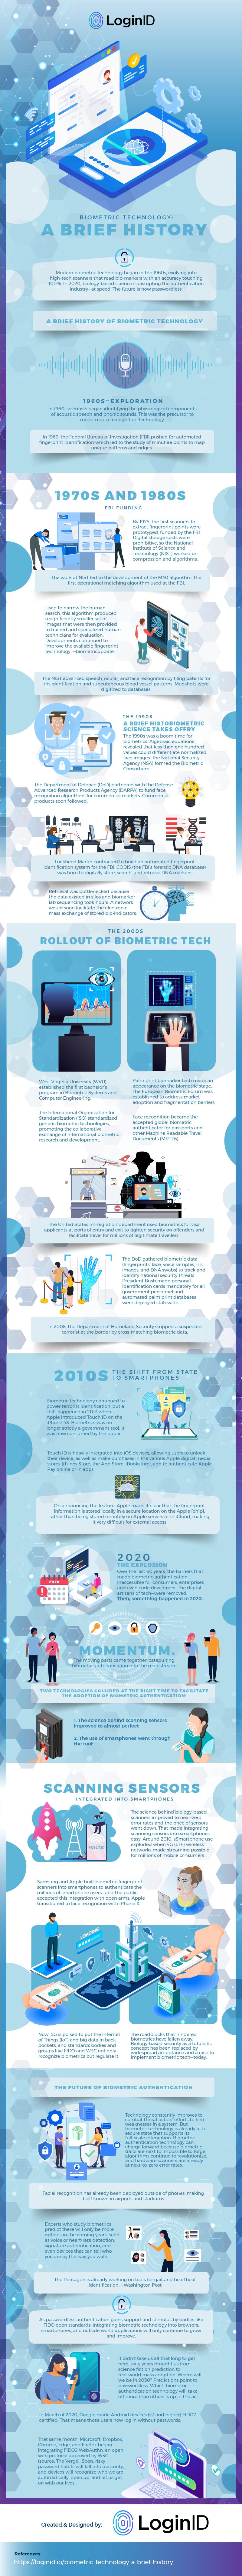 Biometric Technology a brief history2145IIHANDA